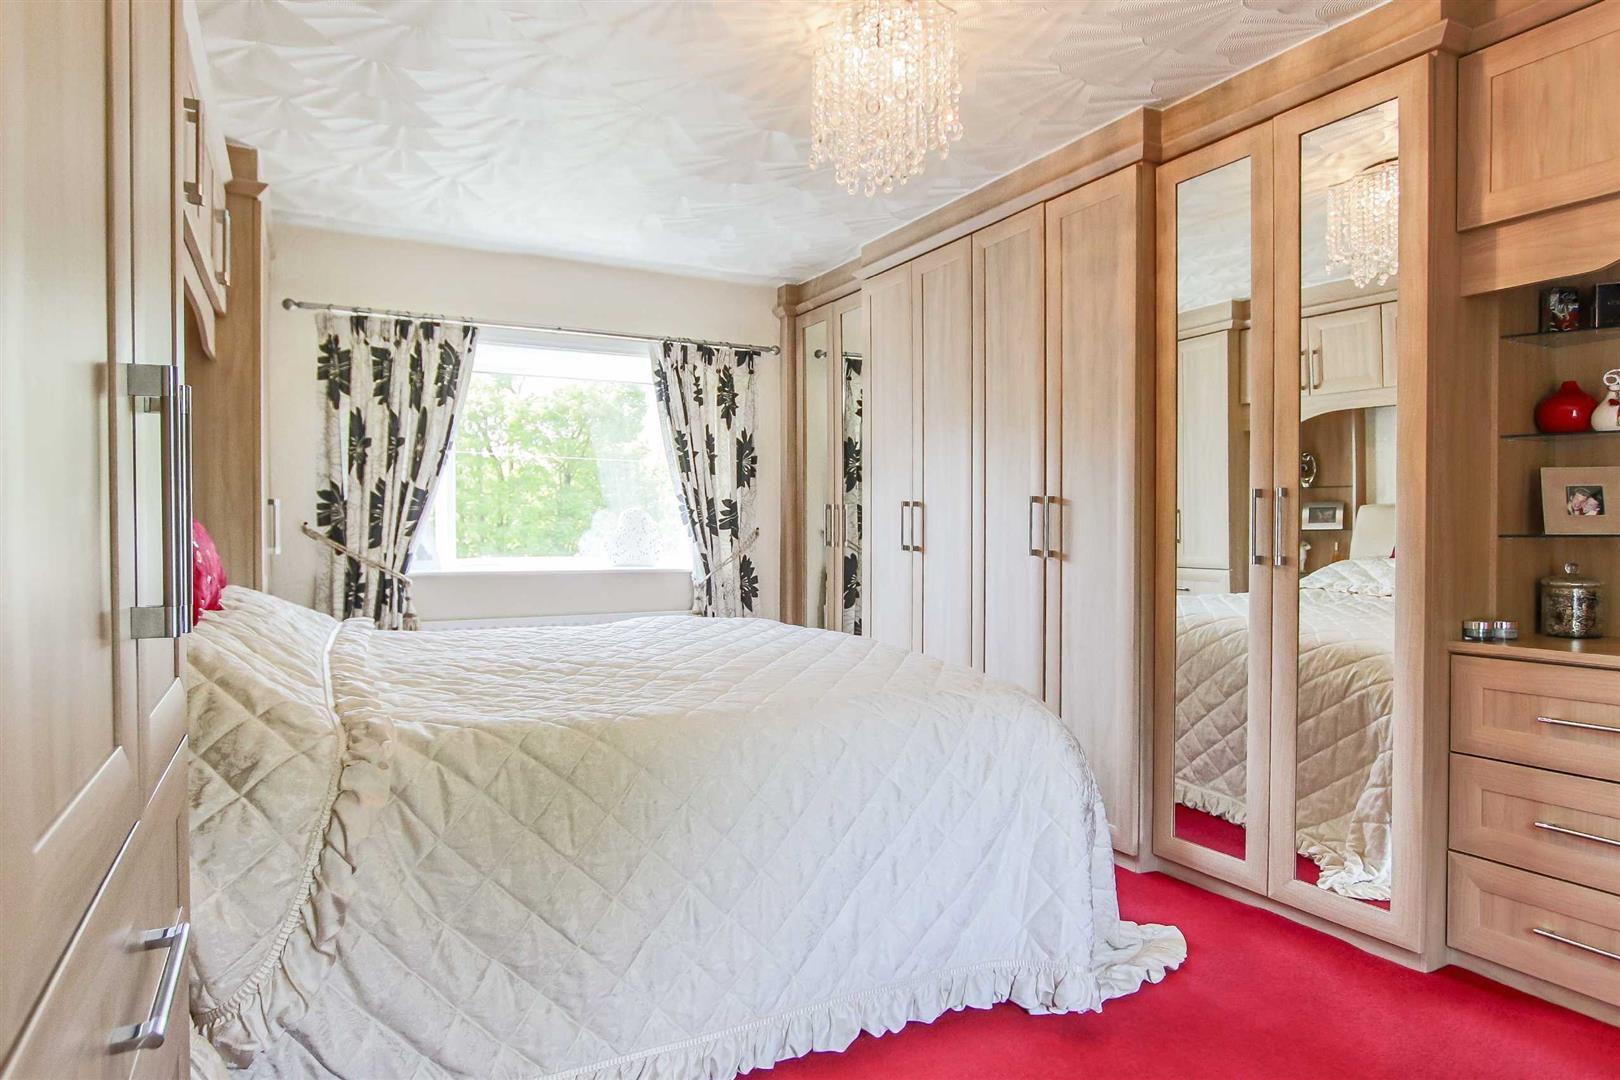 4 Bedroom Detached House For Sale - p006990_23.jpg